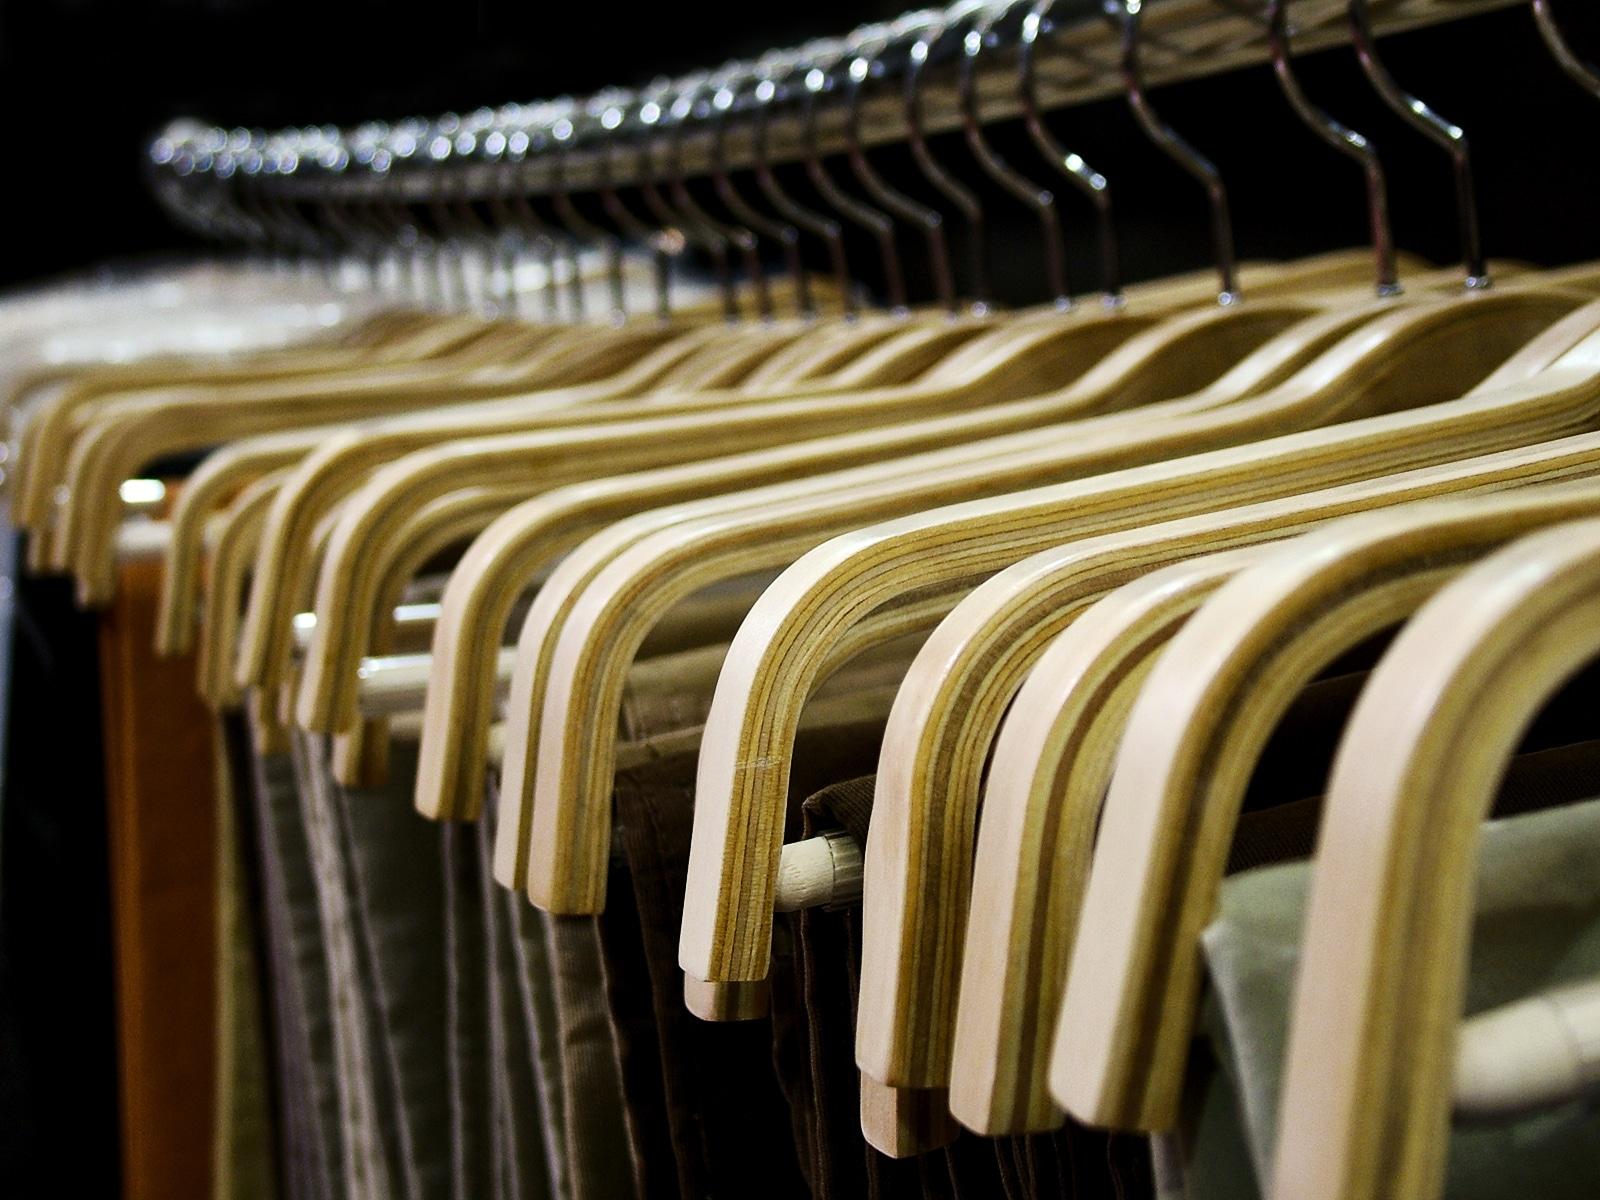 Voordelige feestkleding kopen